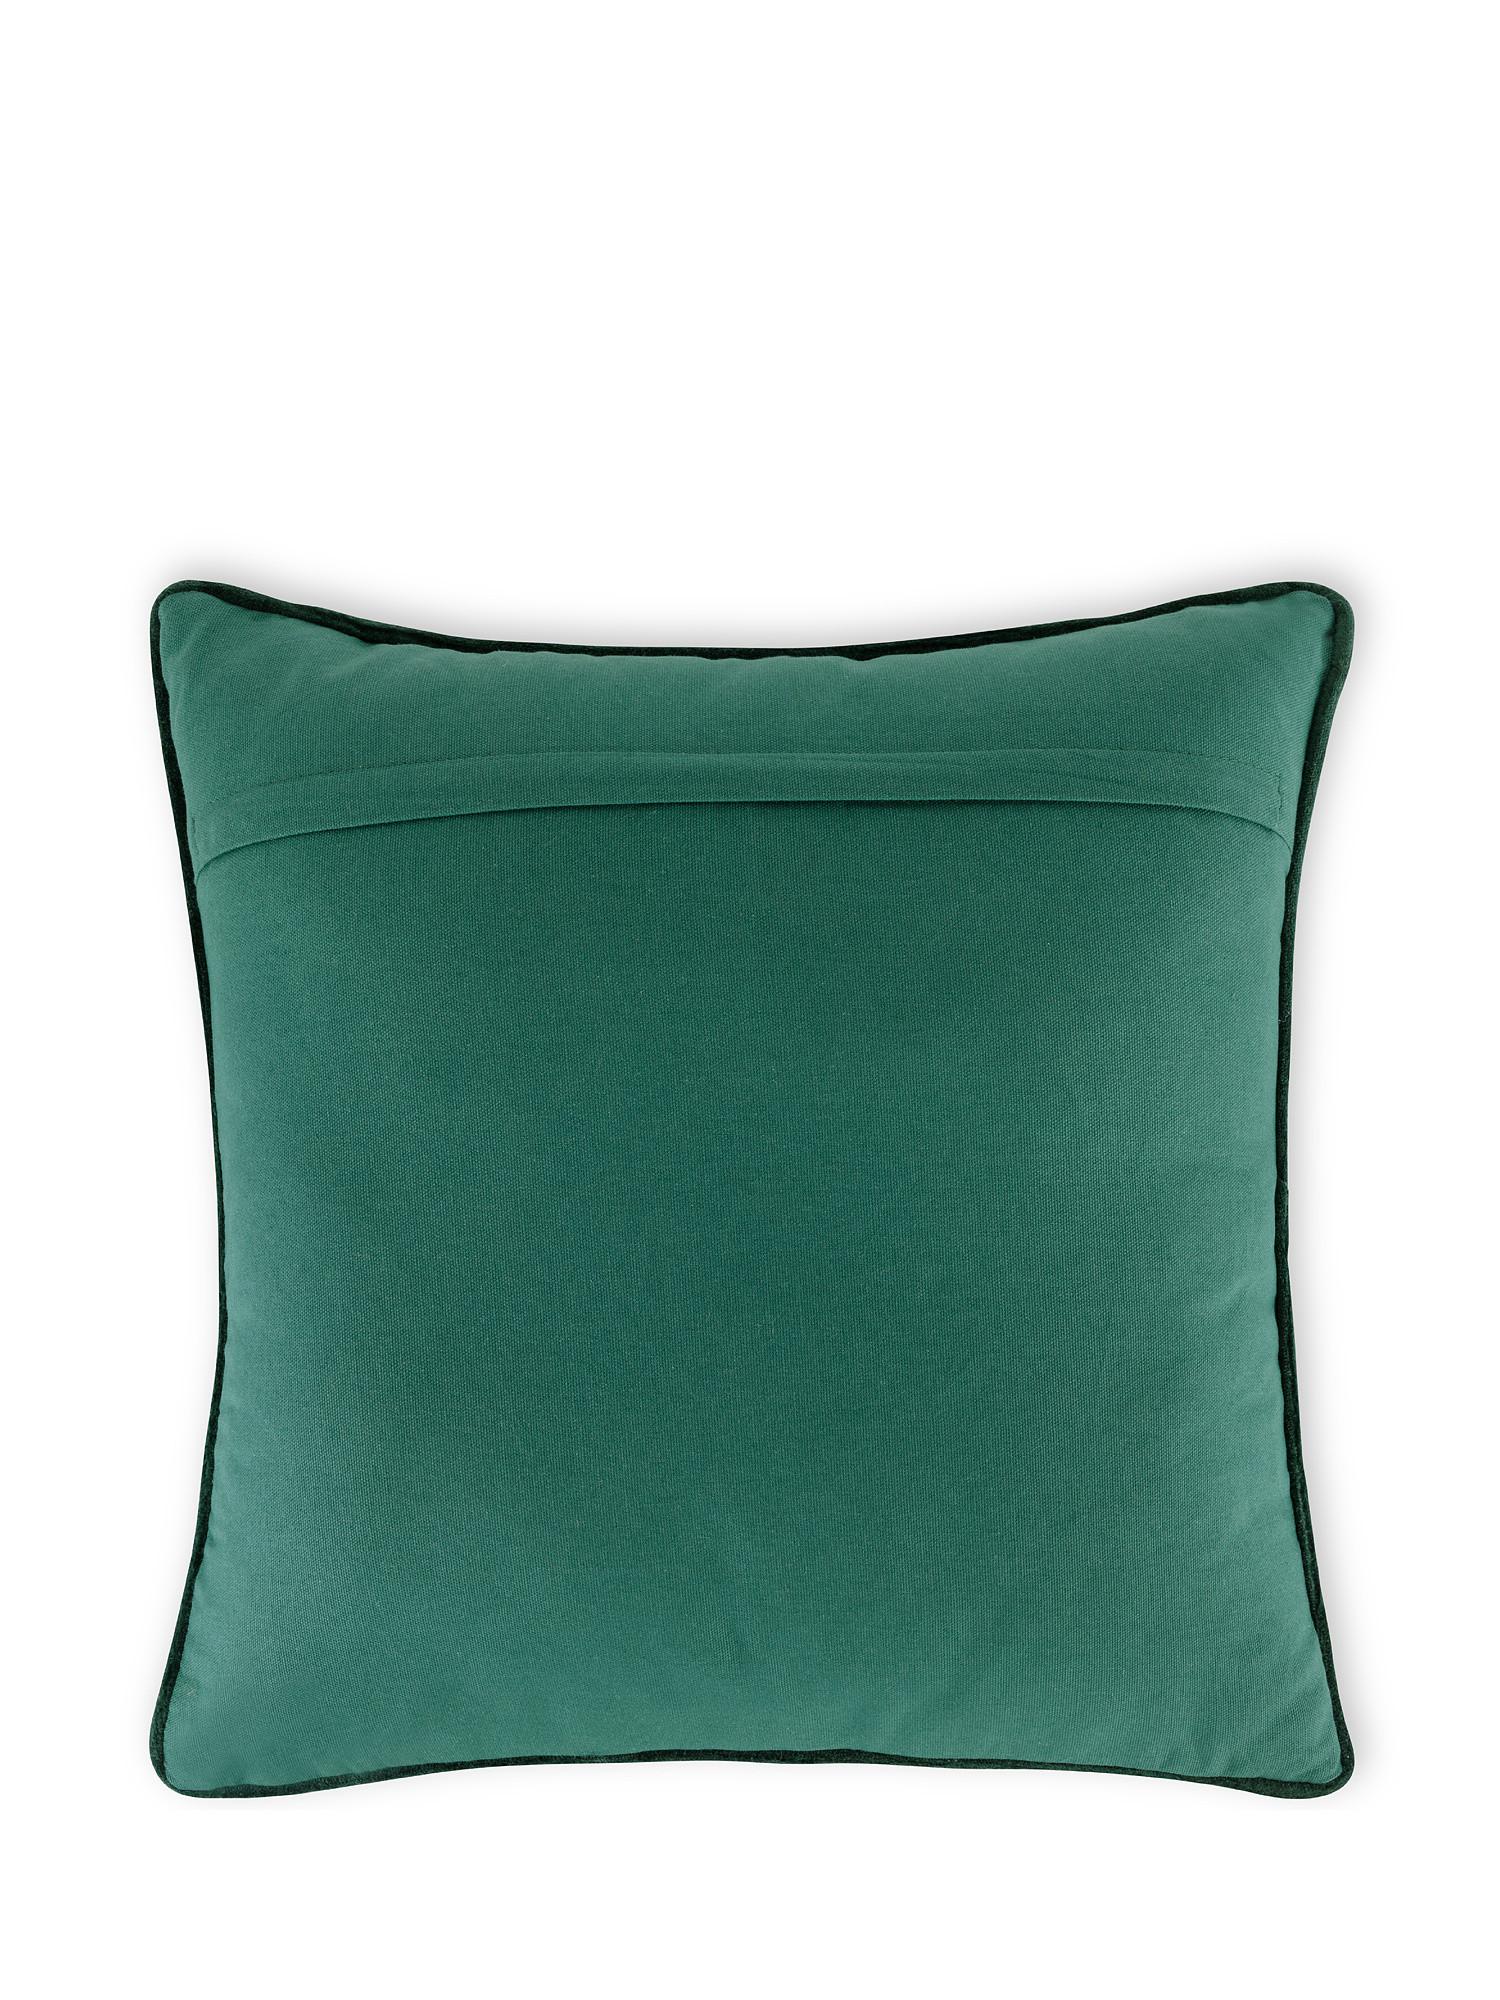 Cuscino velluto motivo foglie 45x45cm, Verde, large image number 1